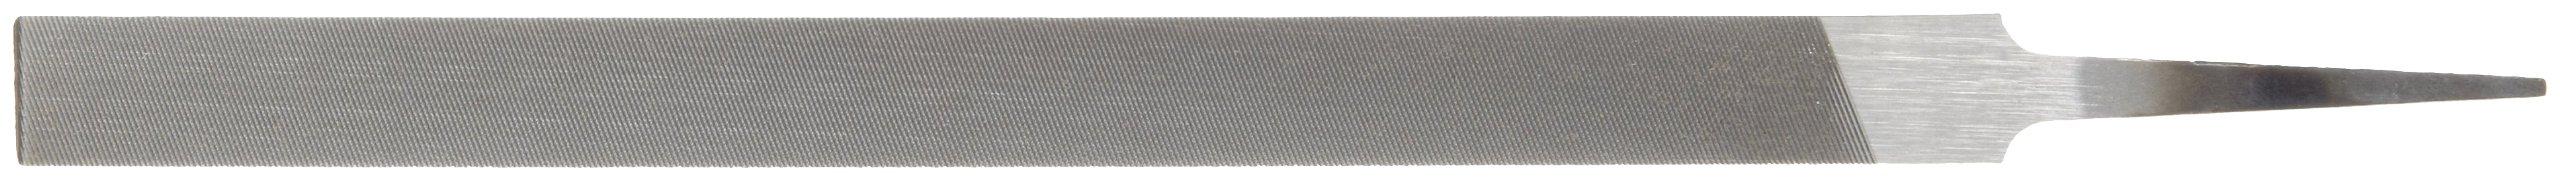 Nicholson Pillar File, Swiss Pattern, Double Cut, Rectangular, #0 Coarseness, 8'' Length